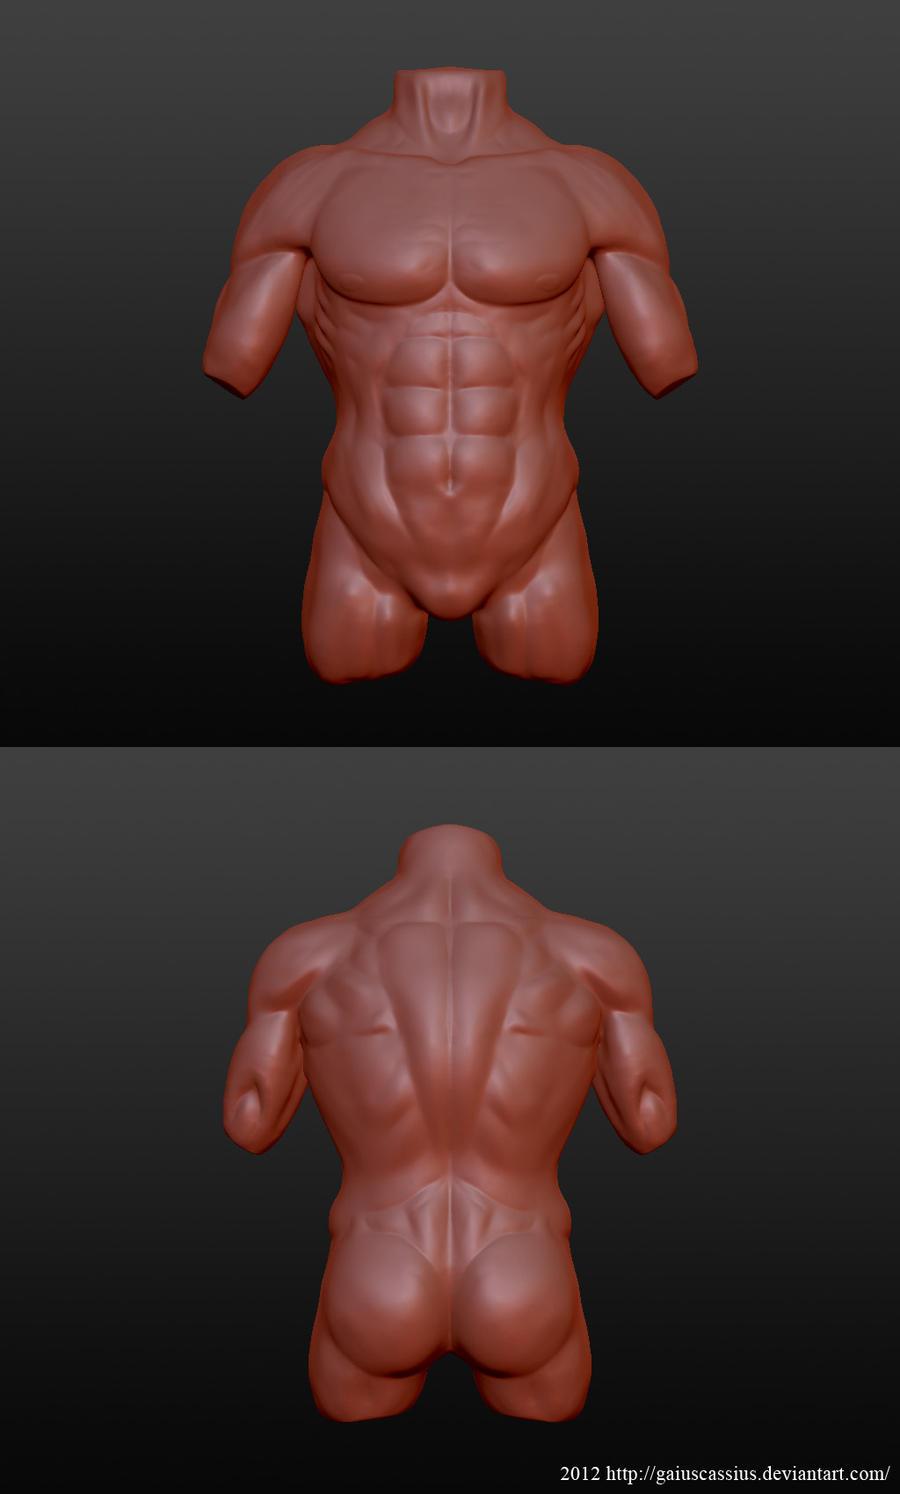 Anatomy study - male torso by CassiusProps on DeviantArt